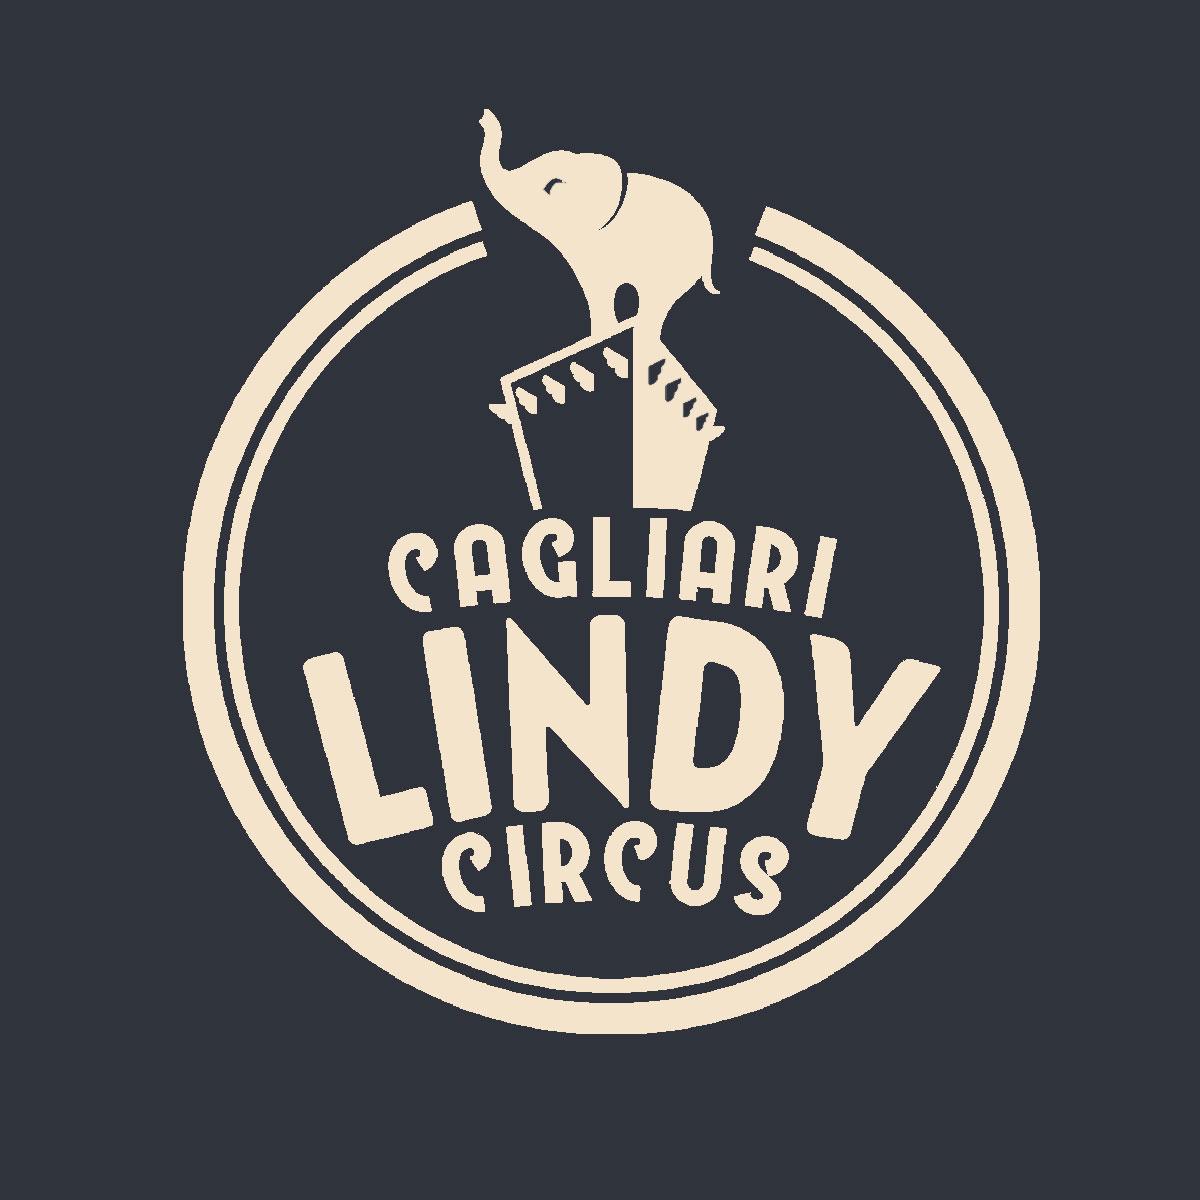 Cagliari Lindy Circus